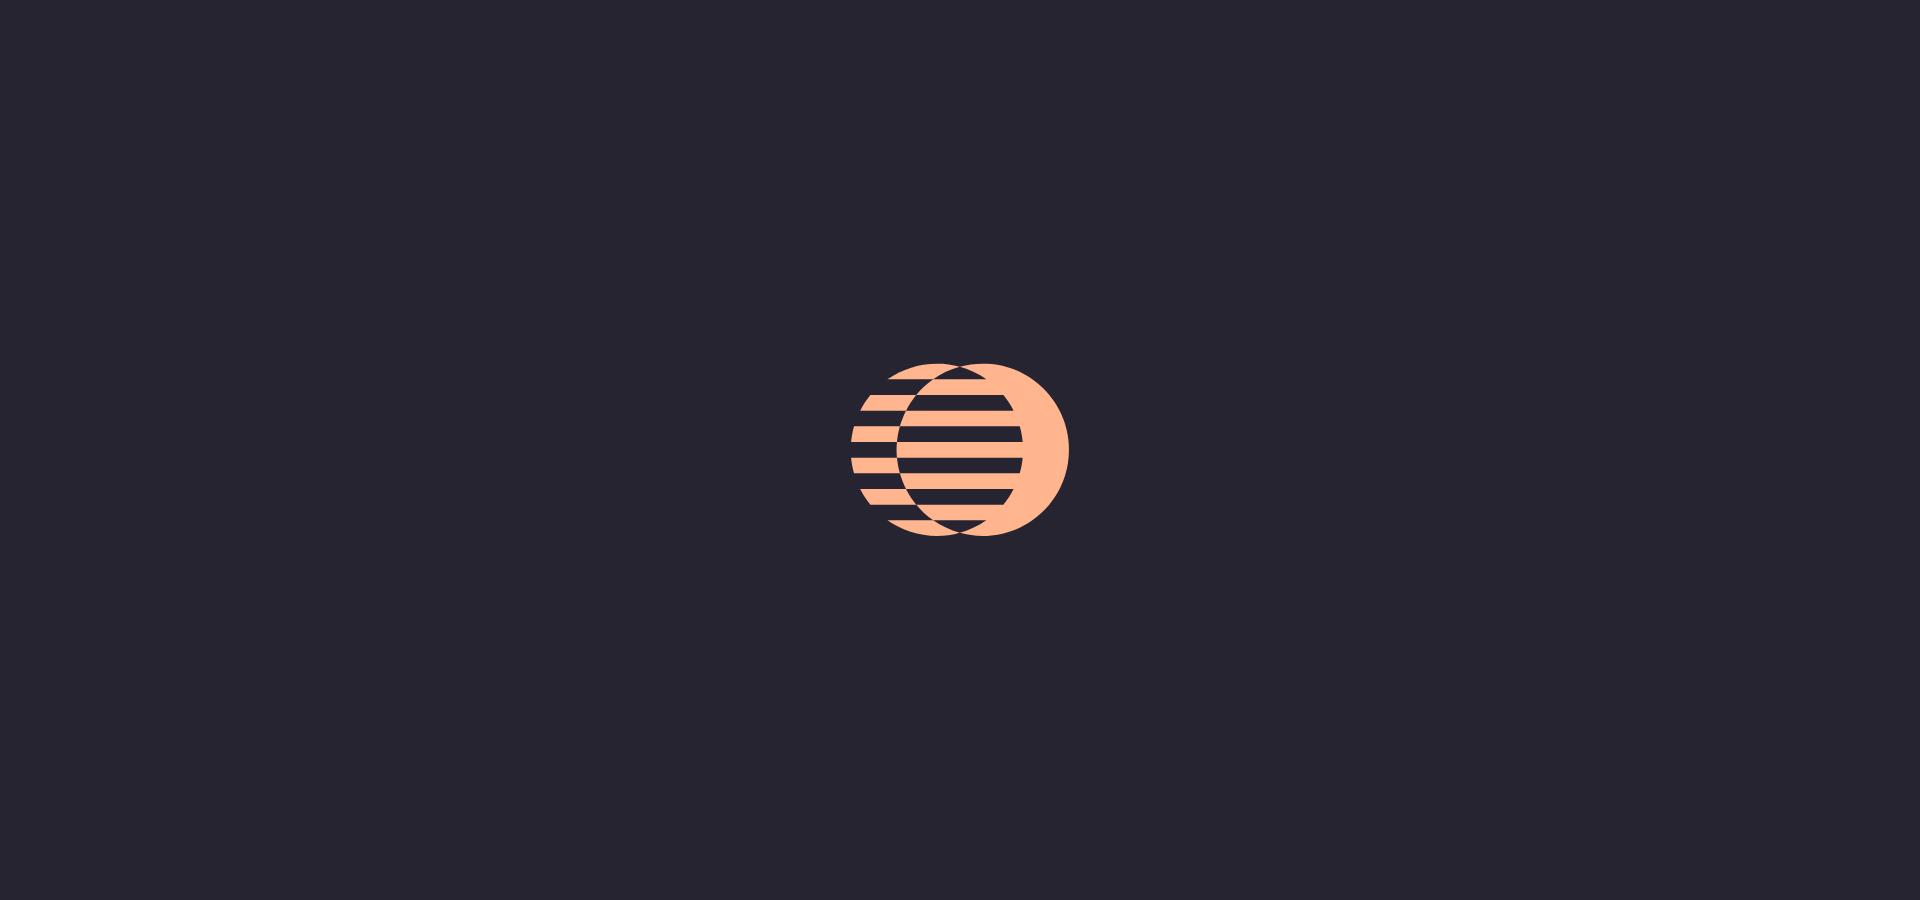 Dominik-Pacholczyk-Logo-Design-Collection-15